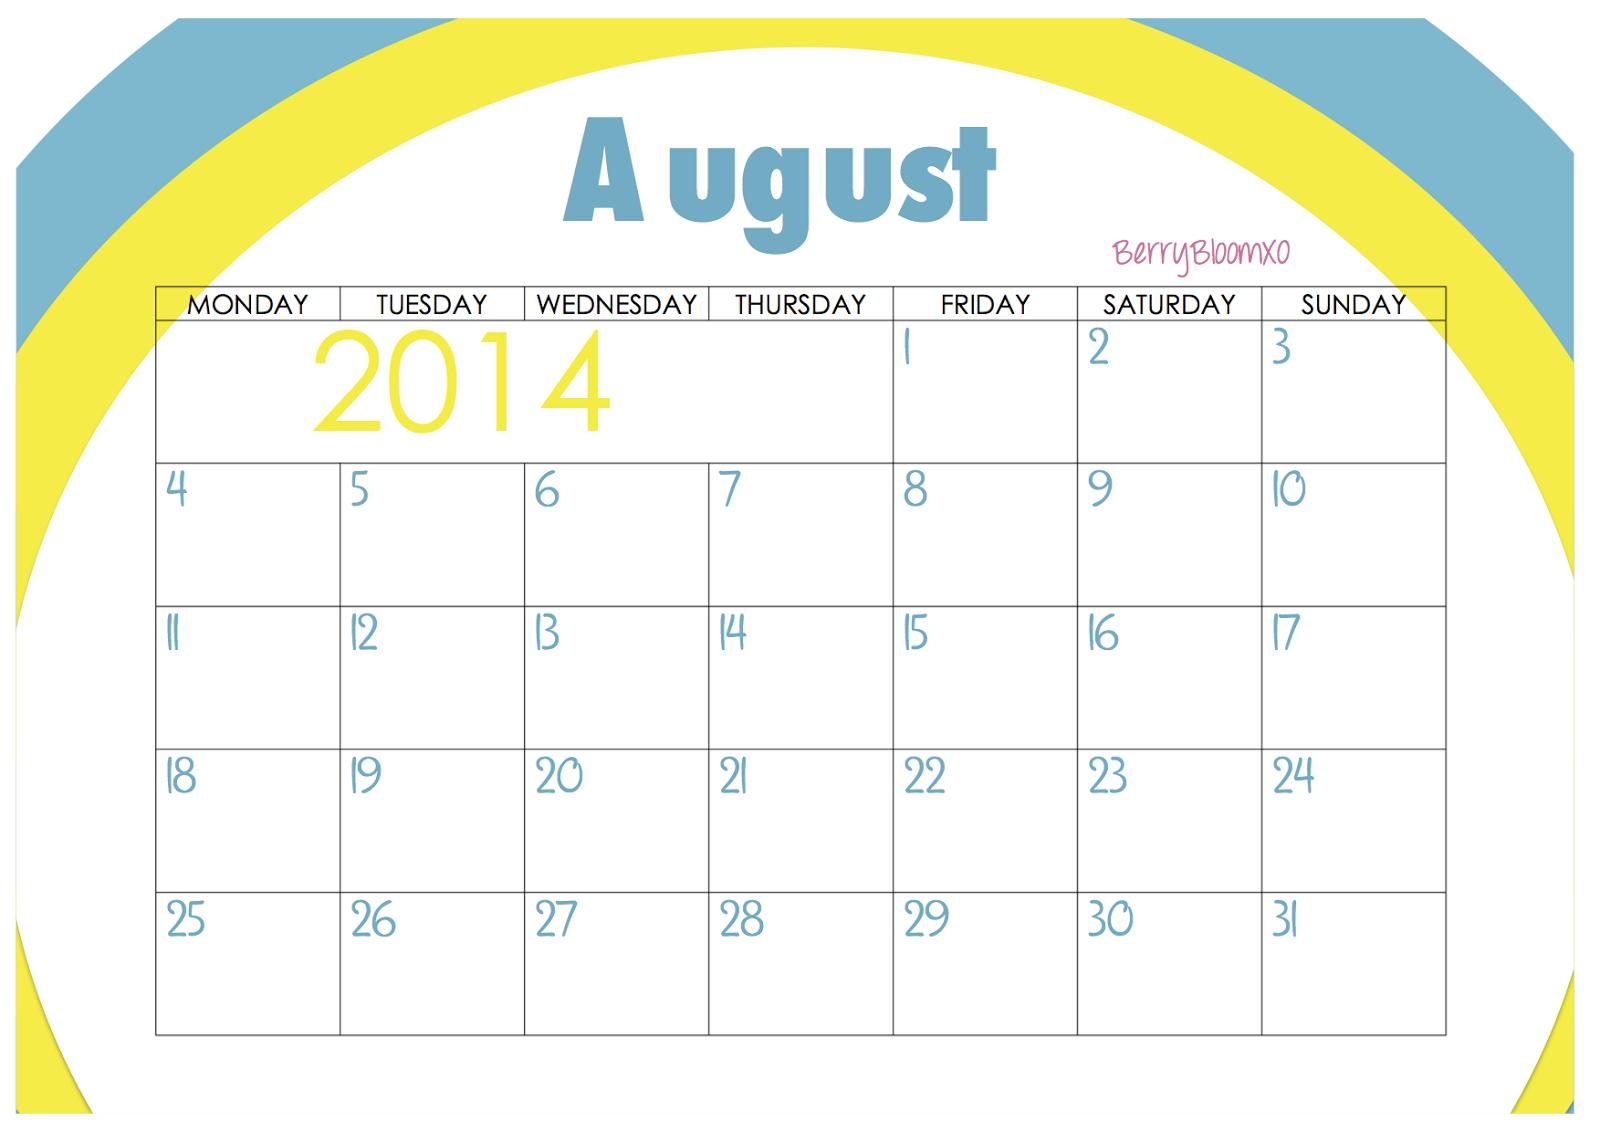 Free Printable Calendar August 2014 August 2014 calendar - free